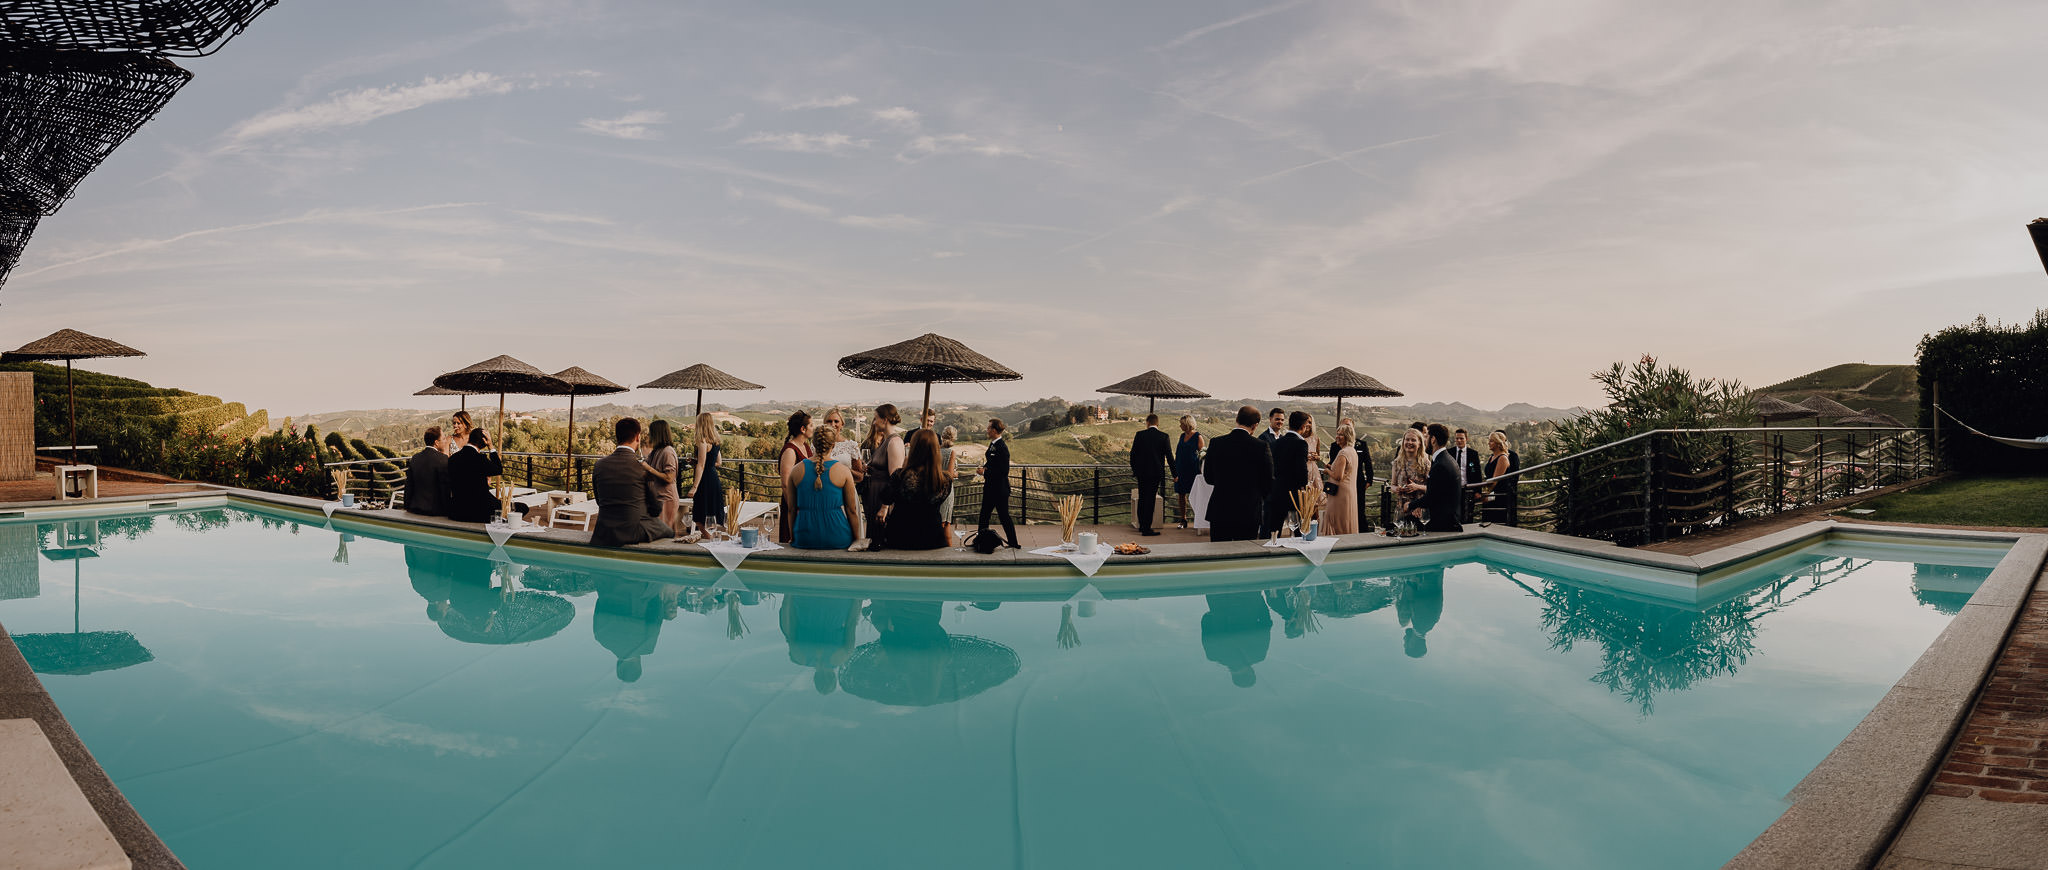 outdoor wedding villa tiboldi